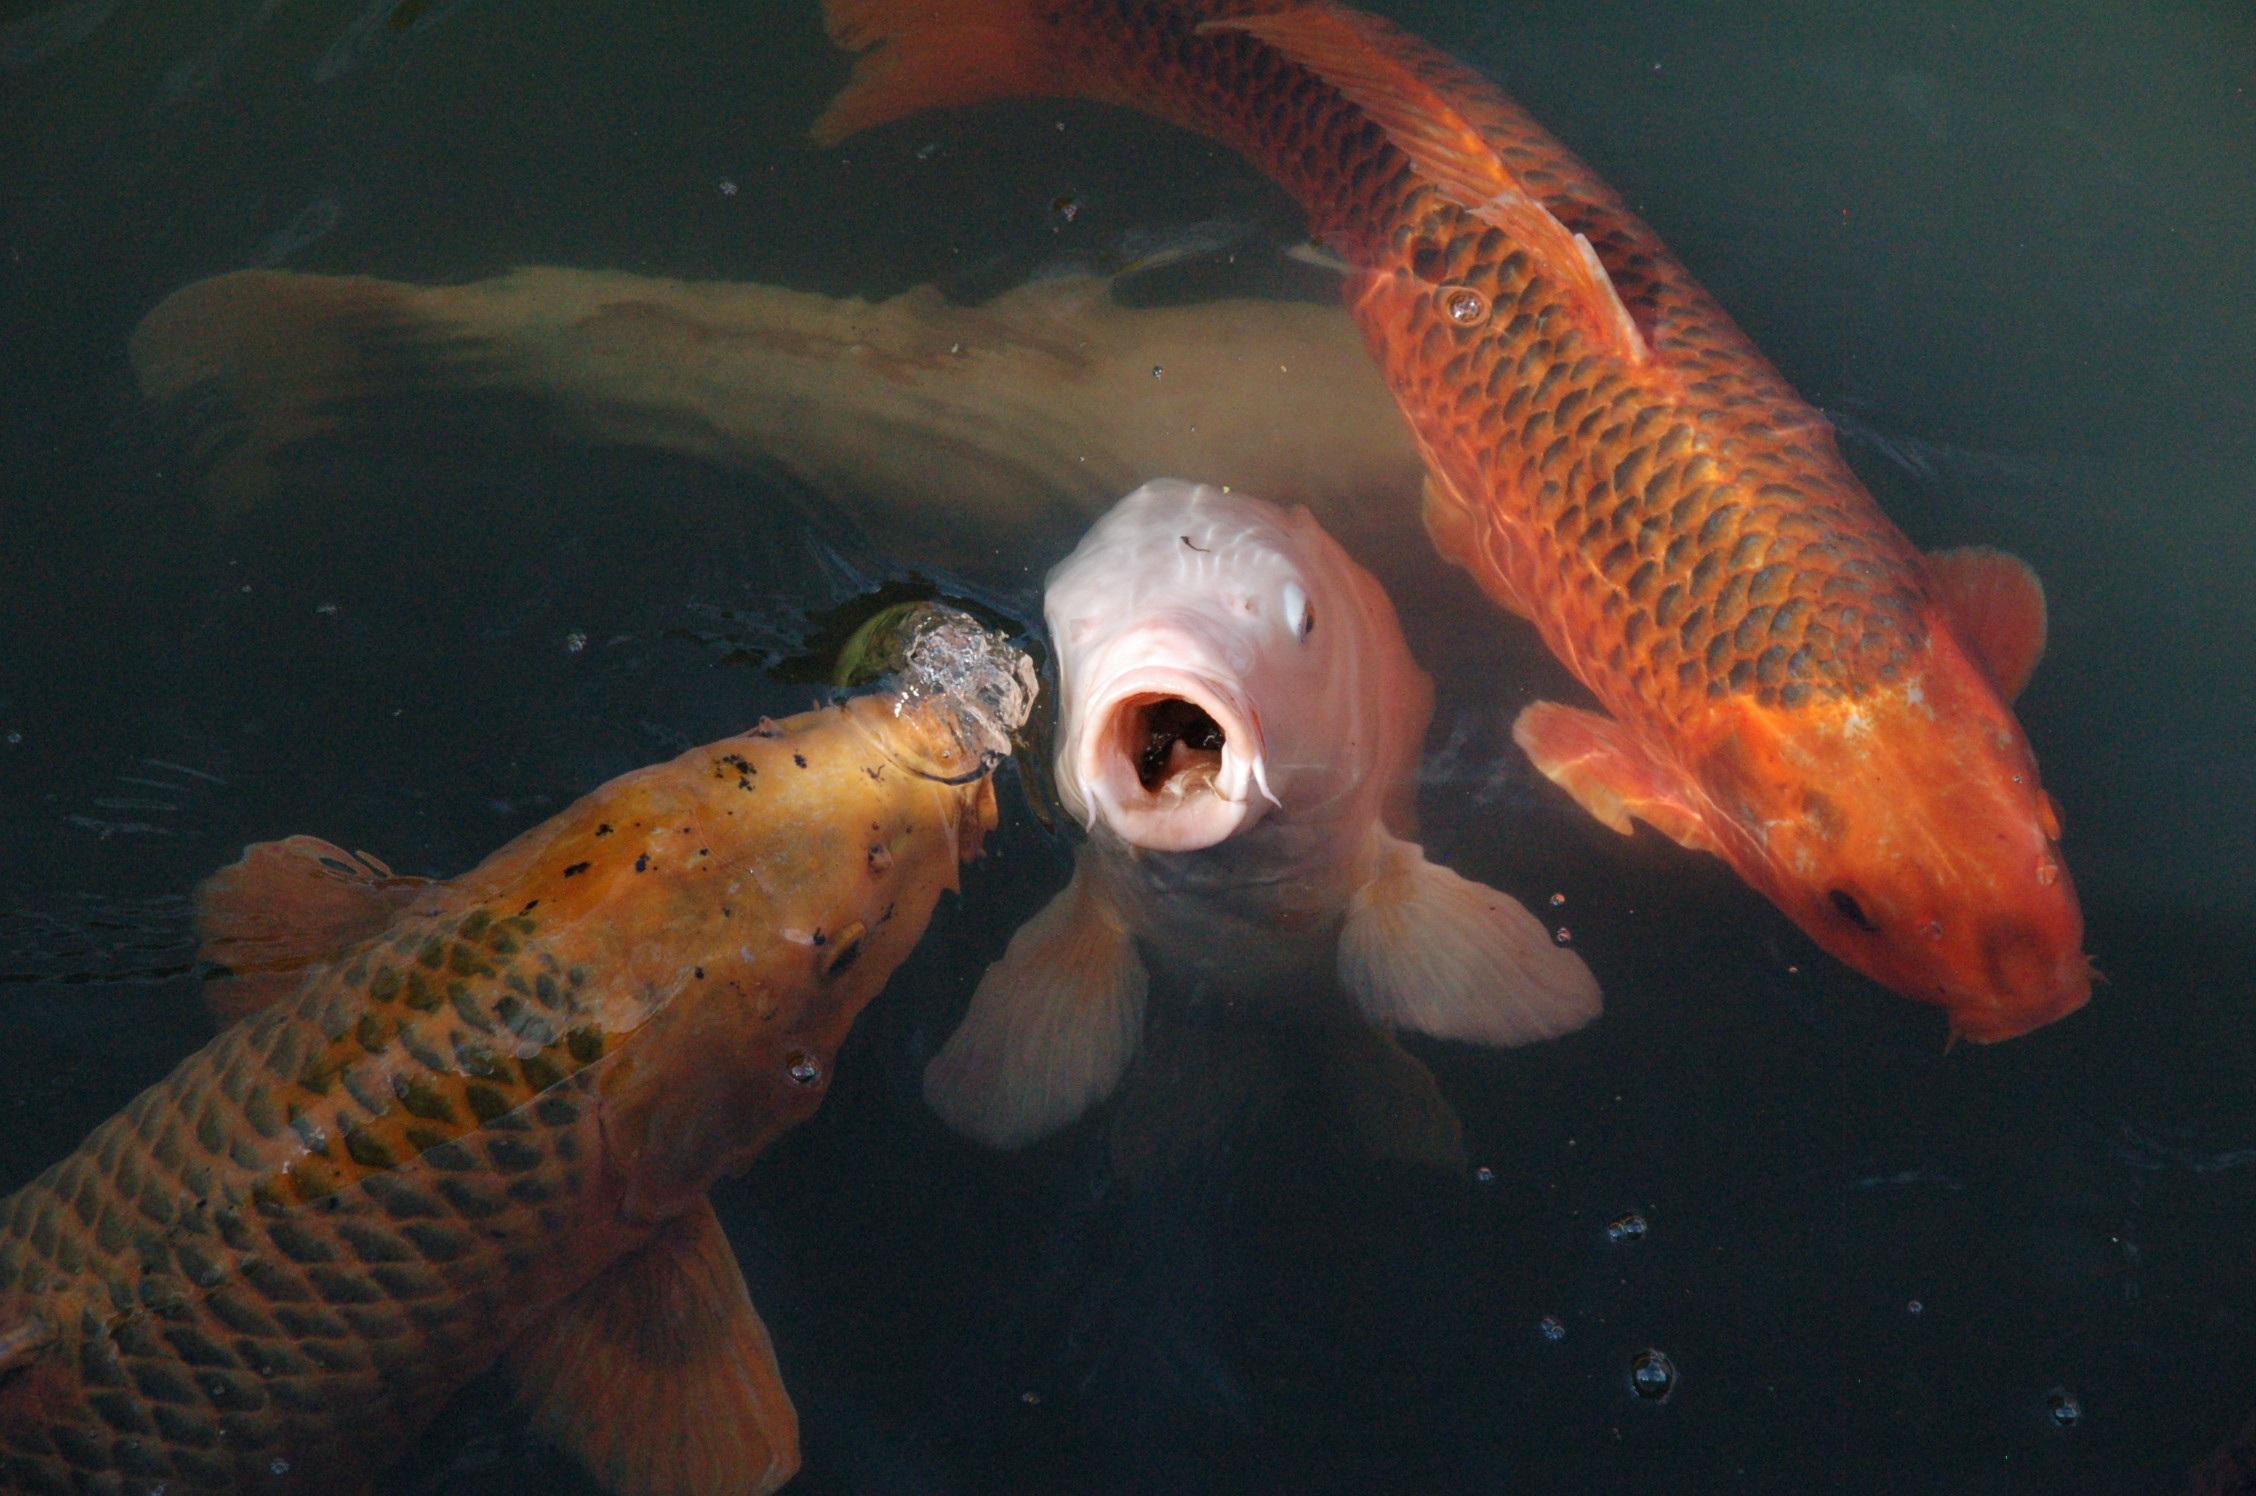 49128338b923a5 vand biologi fisk guldfisk koi karpe rod koi karper komme til syne  havbiologi